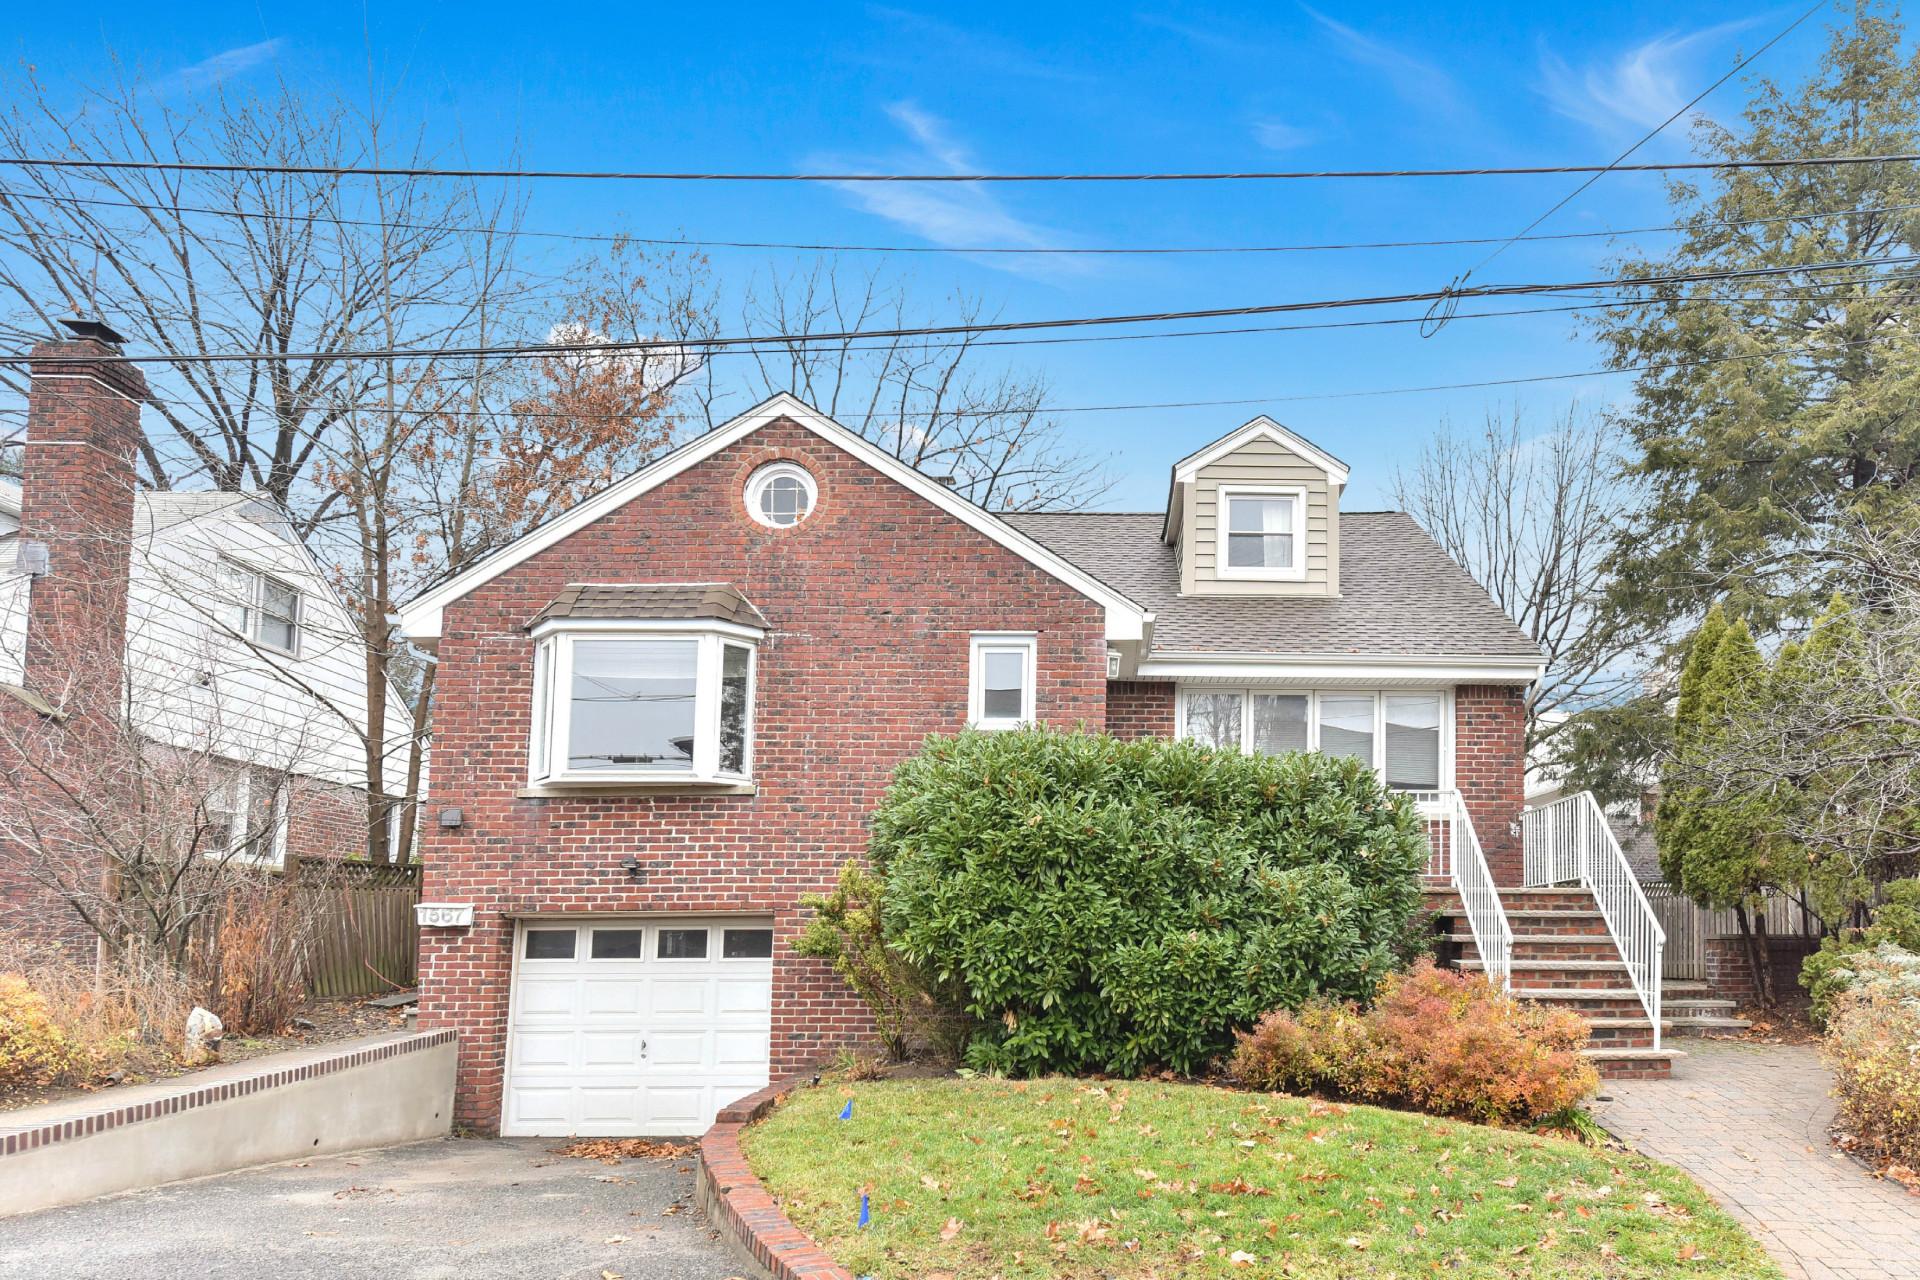 Single Family Home for Rent at Fort Lee's Best Kept Secret 1567 Aston Ter Fort Lee, New Jersey 07024 United States